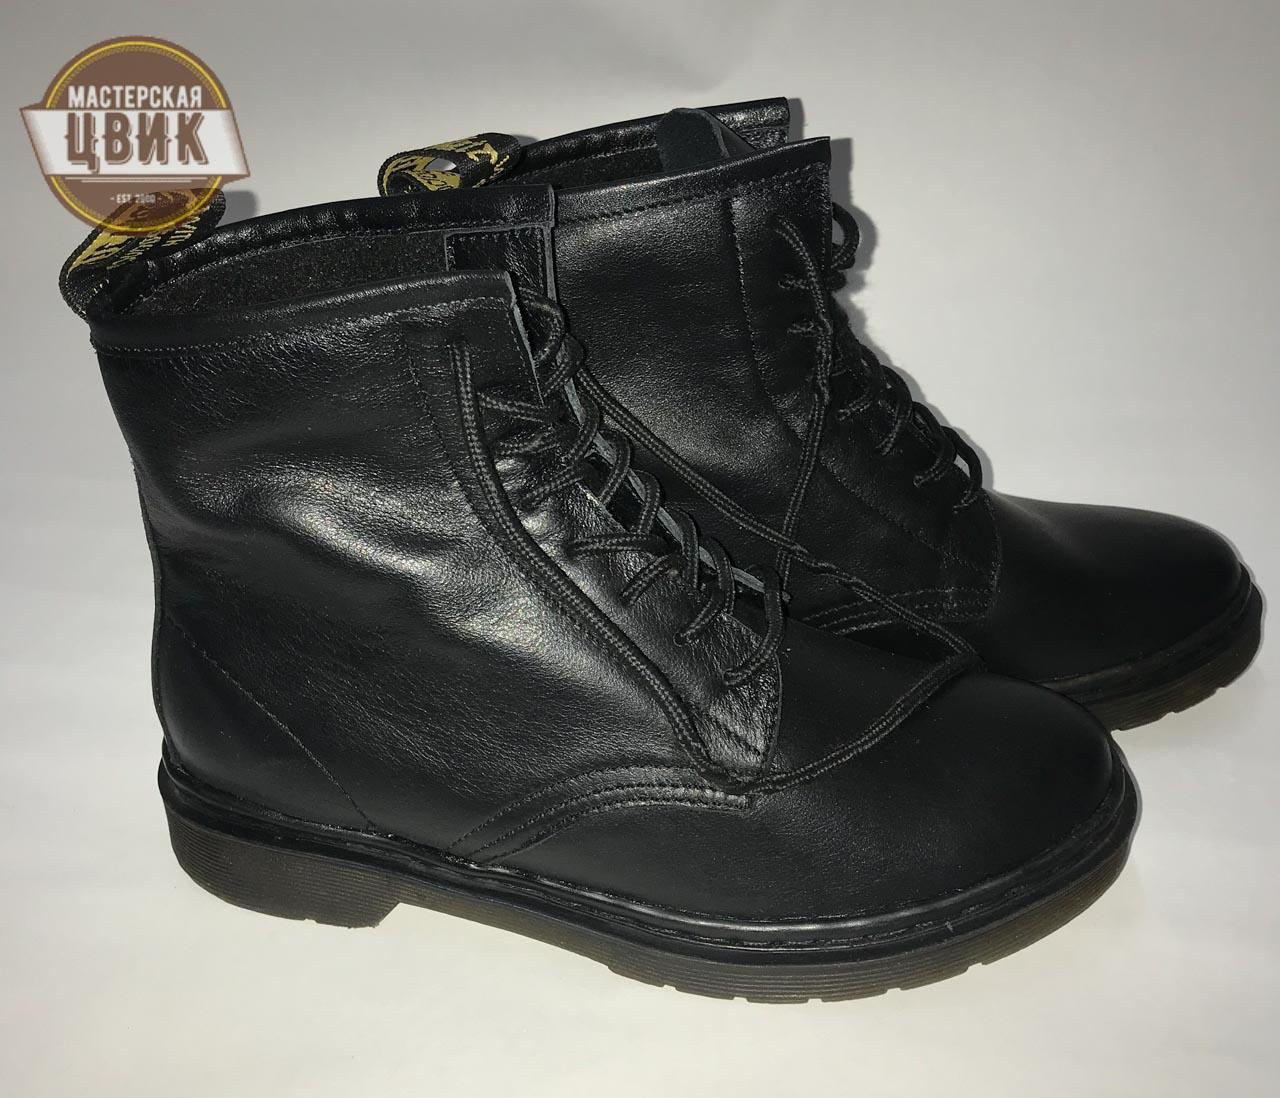 individualnyj-poshiv-obuvi-minsk-65 Индивидуальный пошив обуви